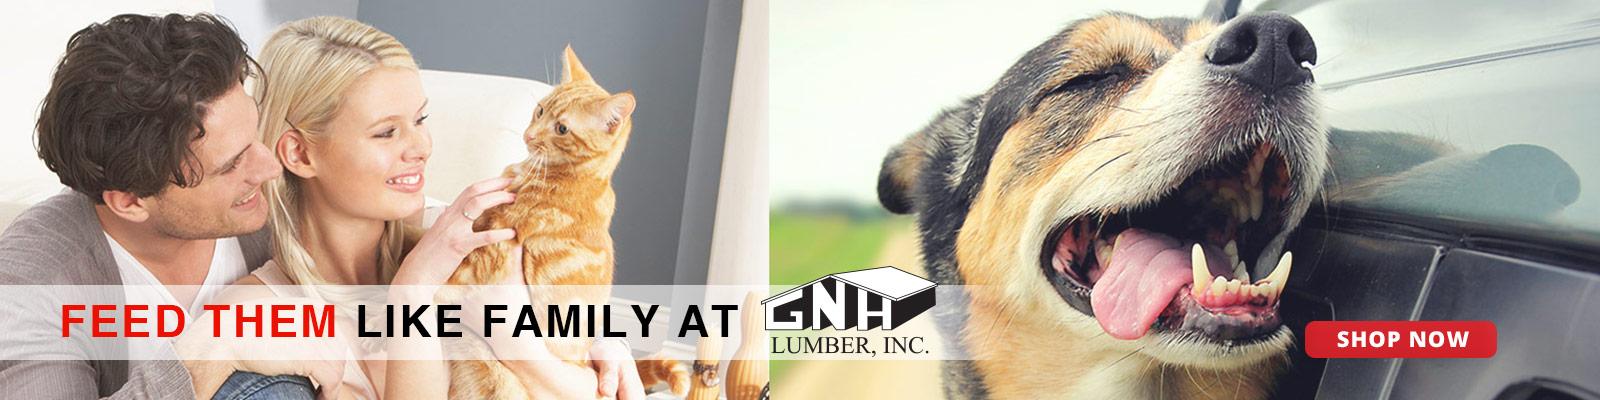 Pet Food at GNH Lumber